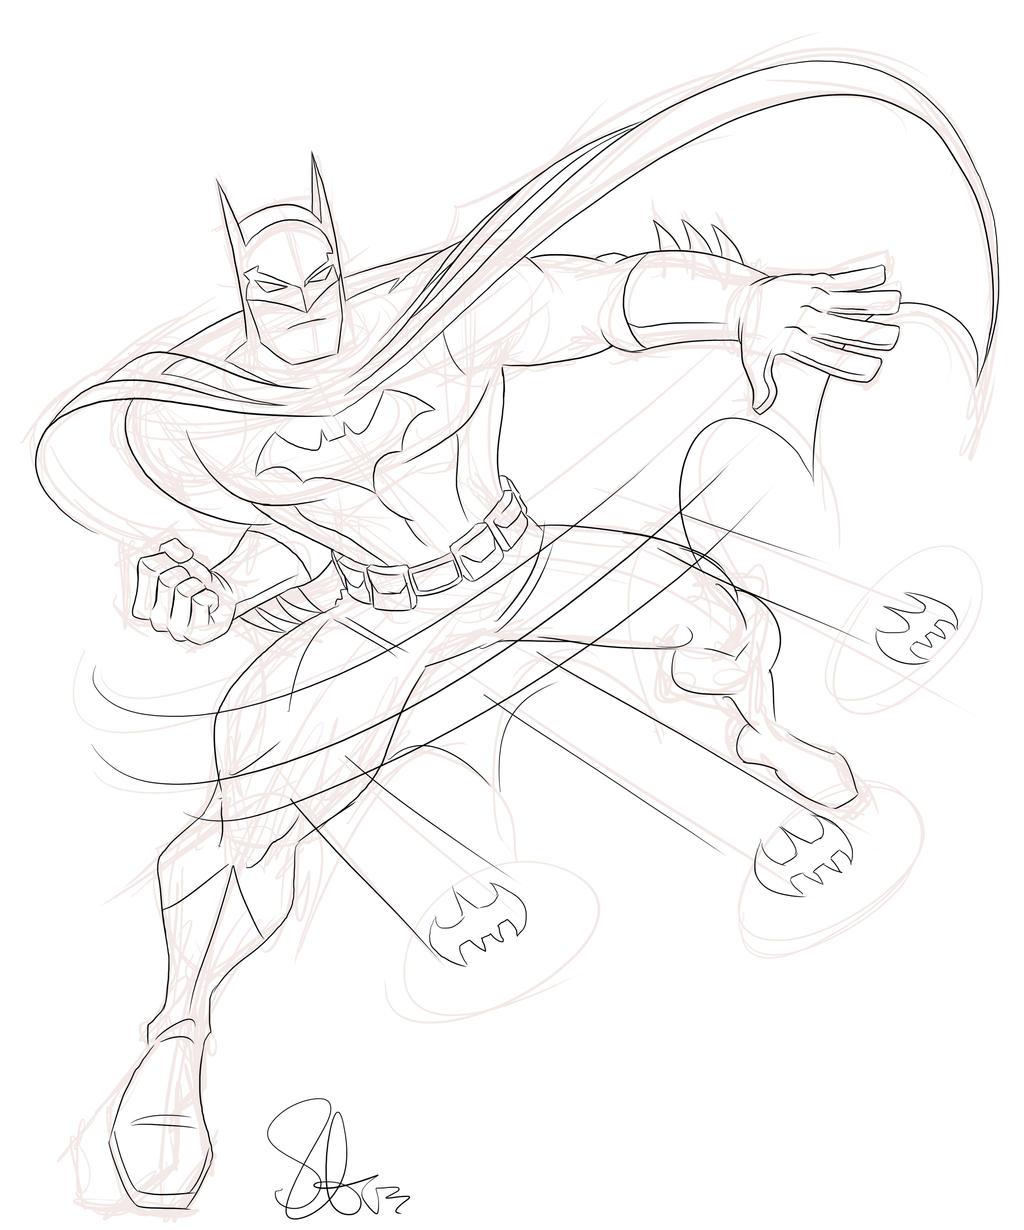 Quick Batman sketch by scootah91